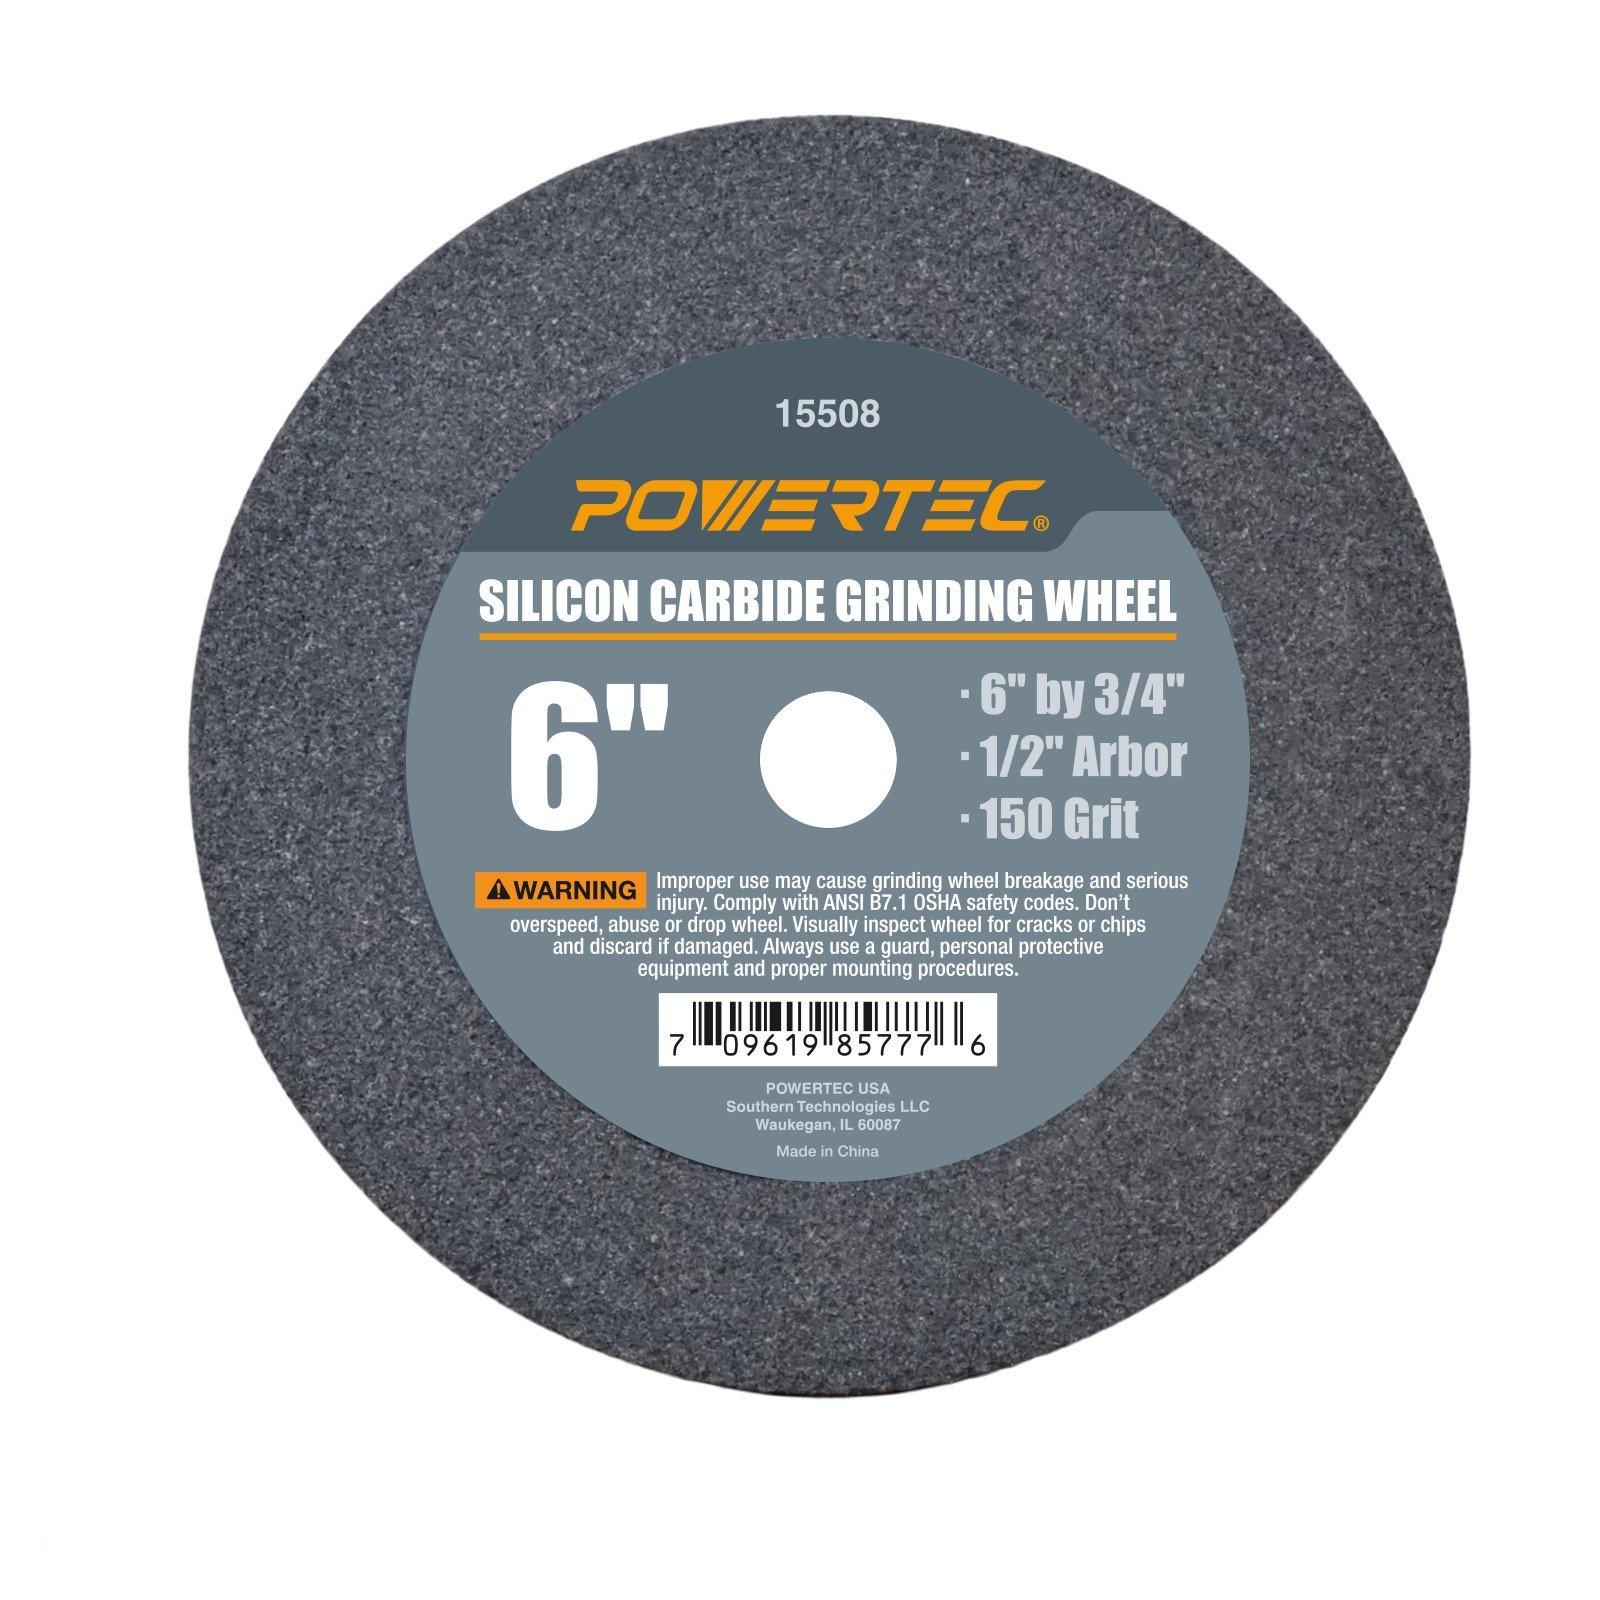 POWERTEC 15508 1/2'' Arbor 150-Grit Silicon Carbide Grinding Wheel, 6'' x 3/4''